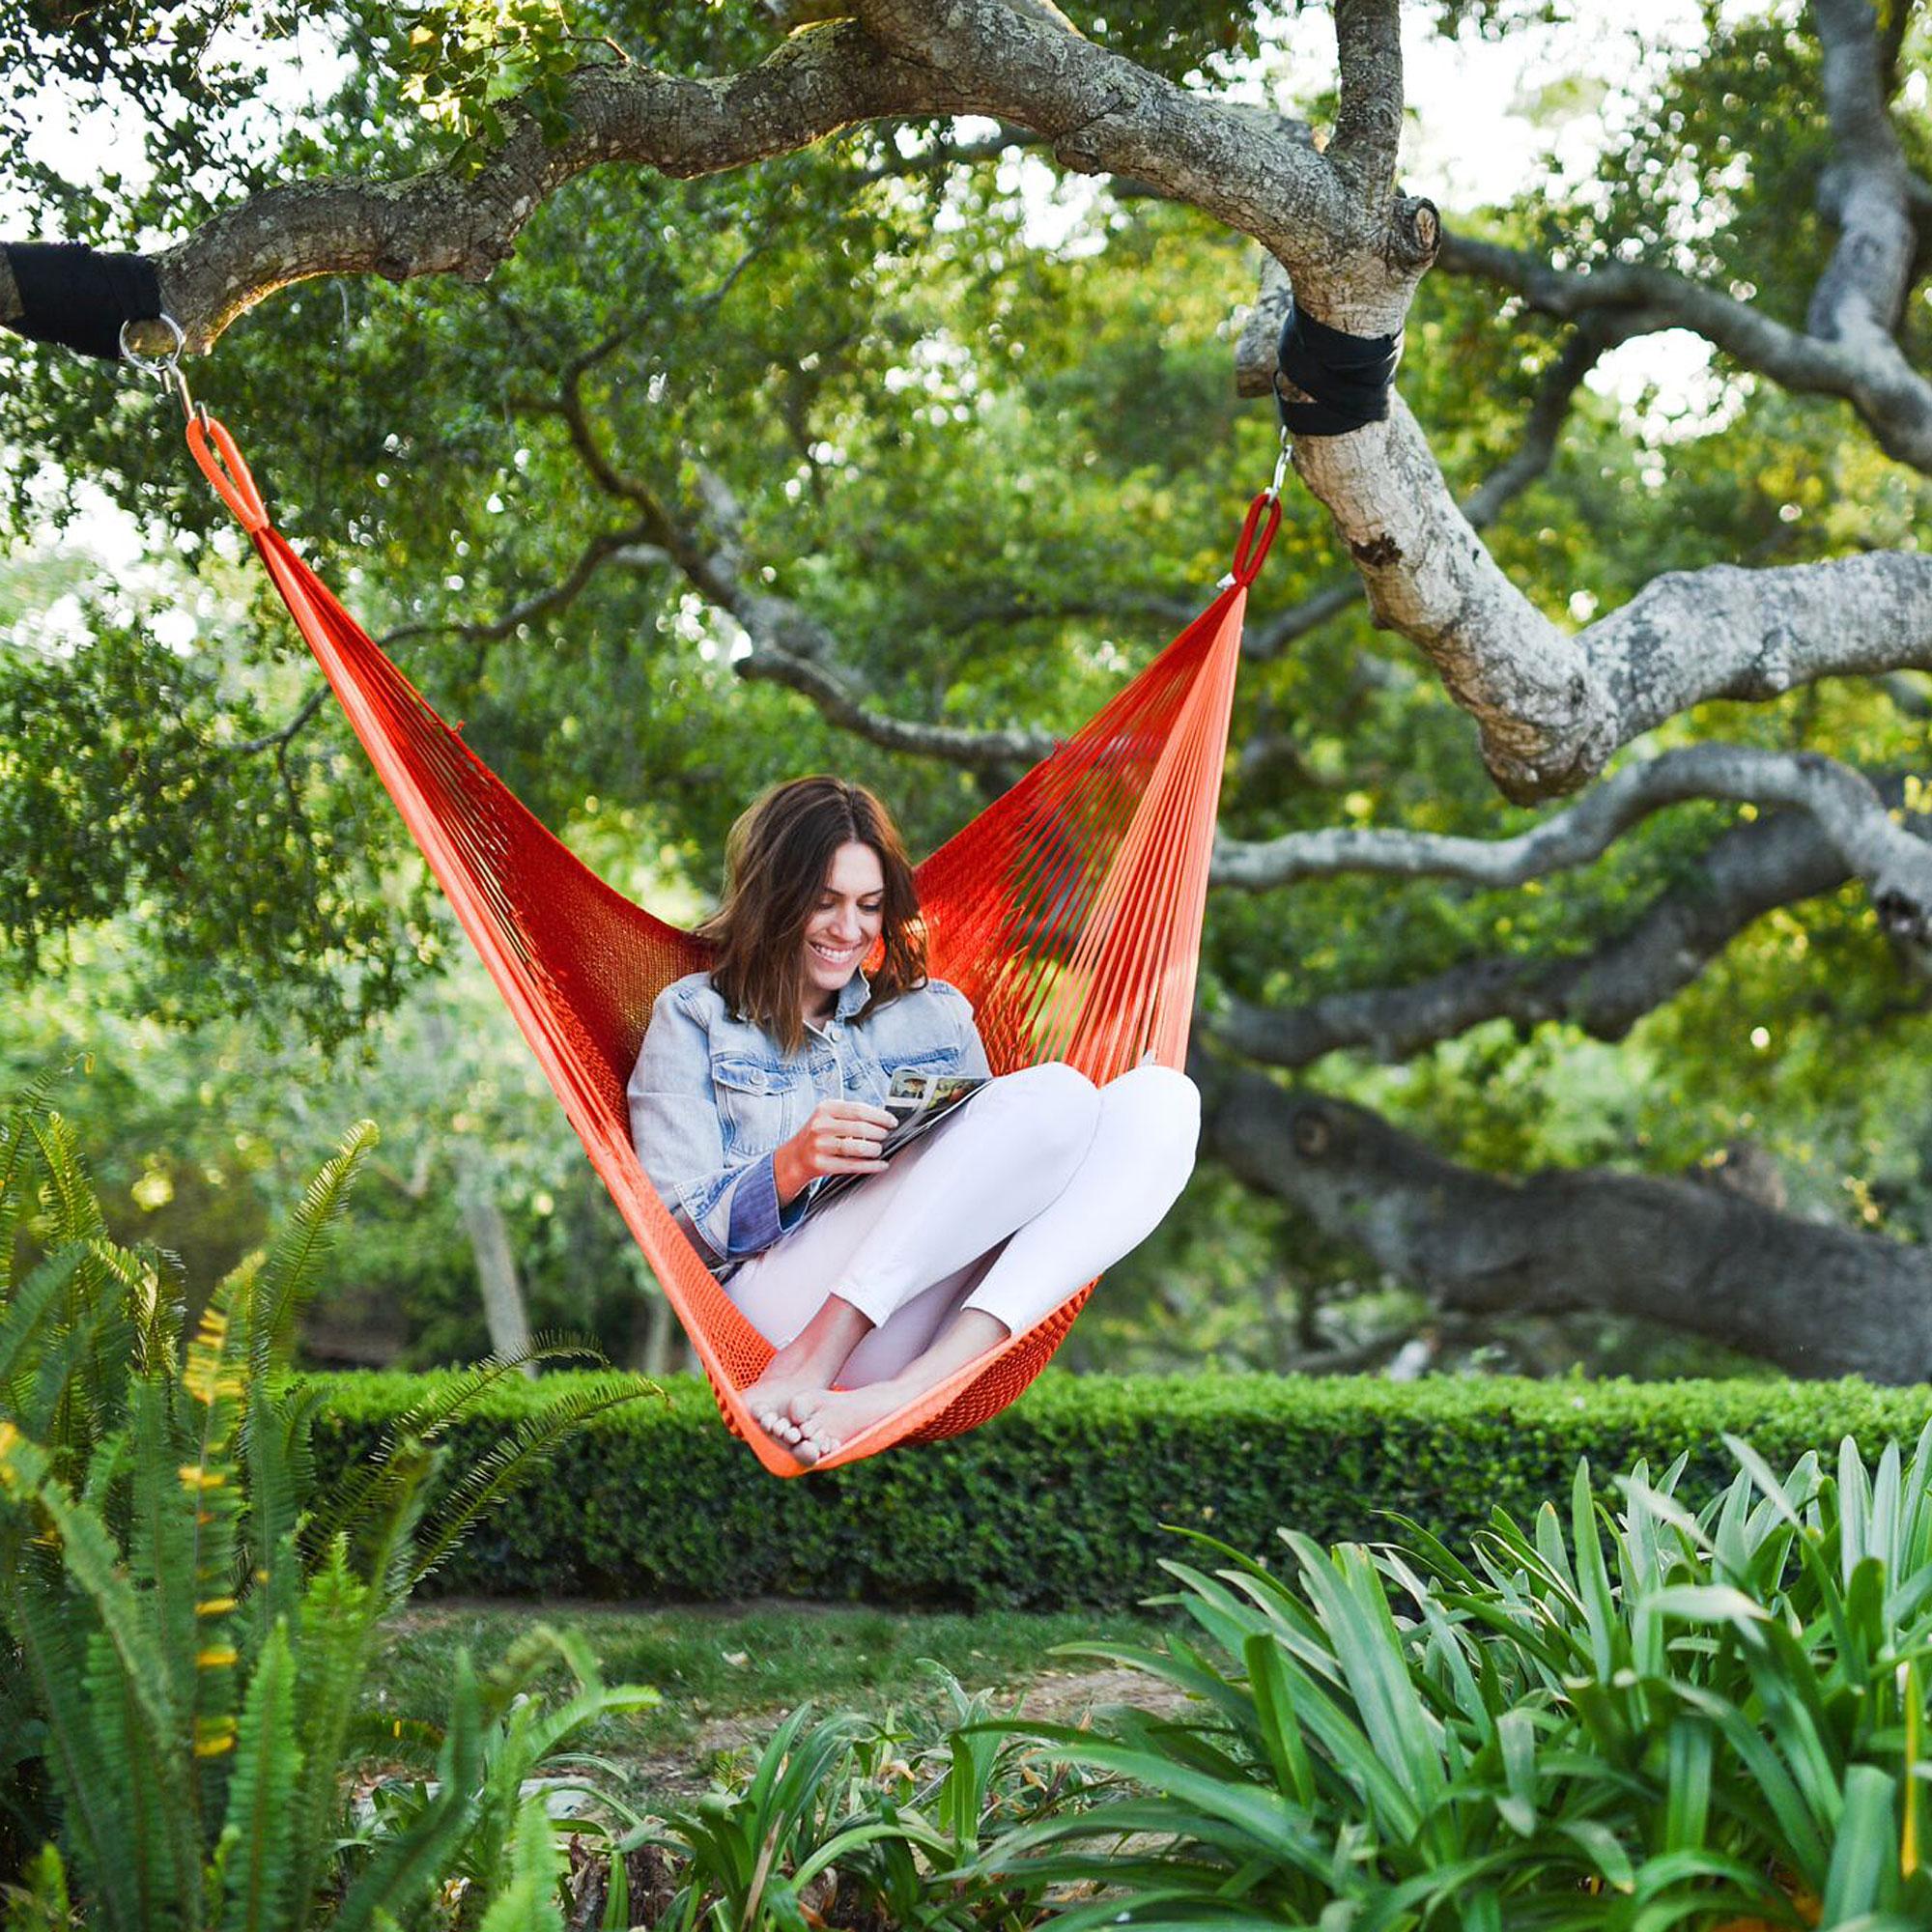 Awesome Backyard Ideas for Kids  Sunset  Sunset Magazine